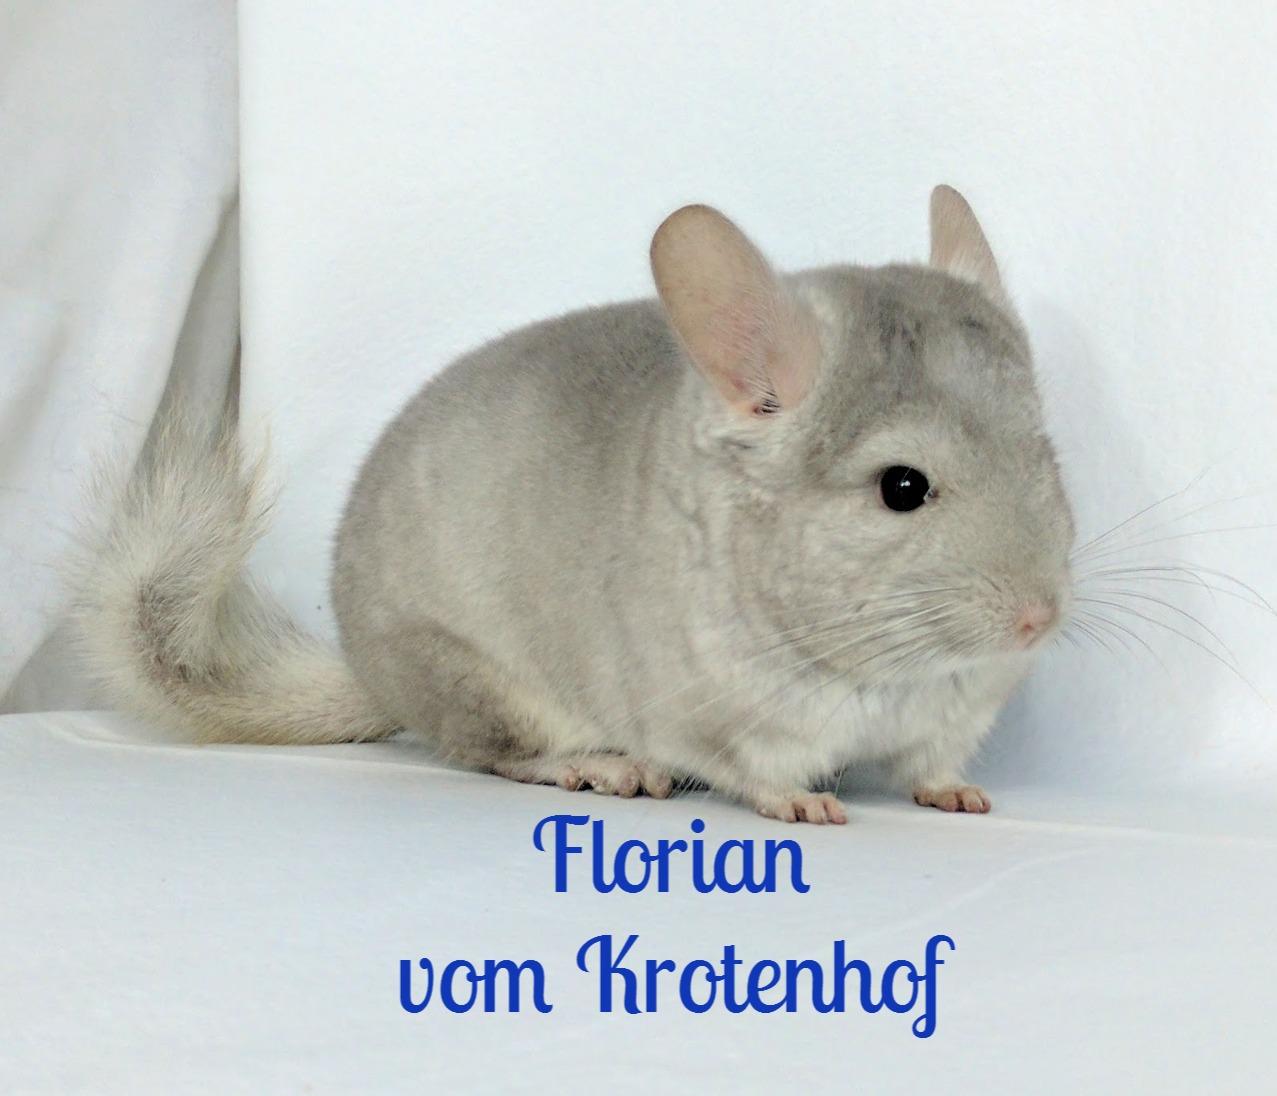 Florian vom Krotenhof